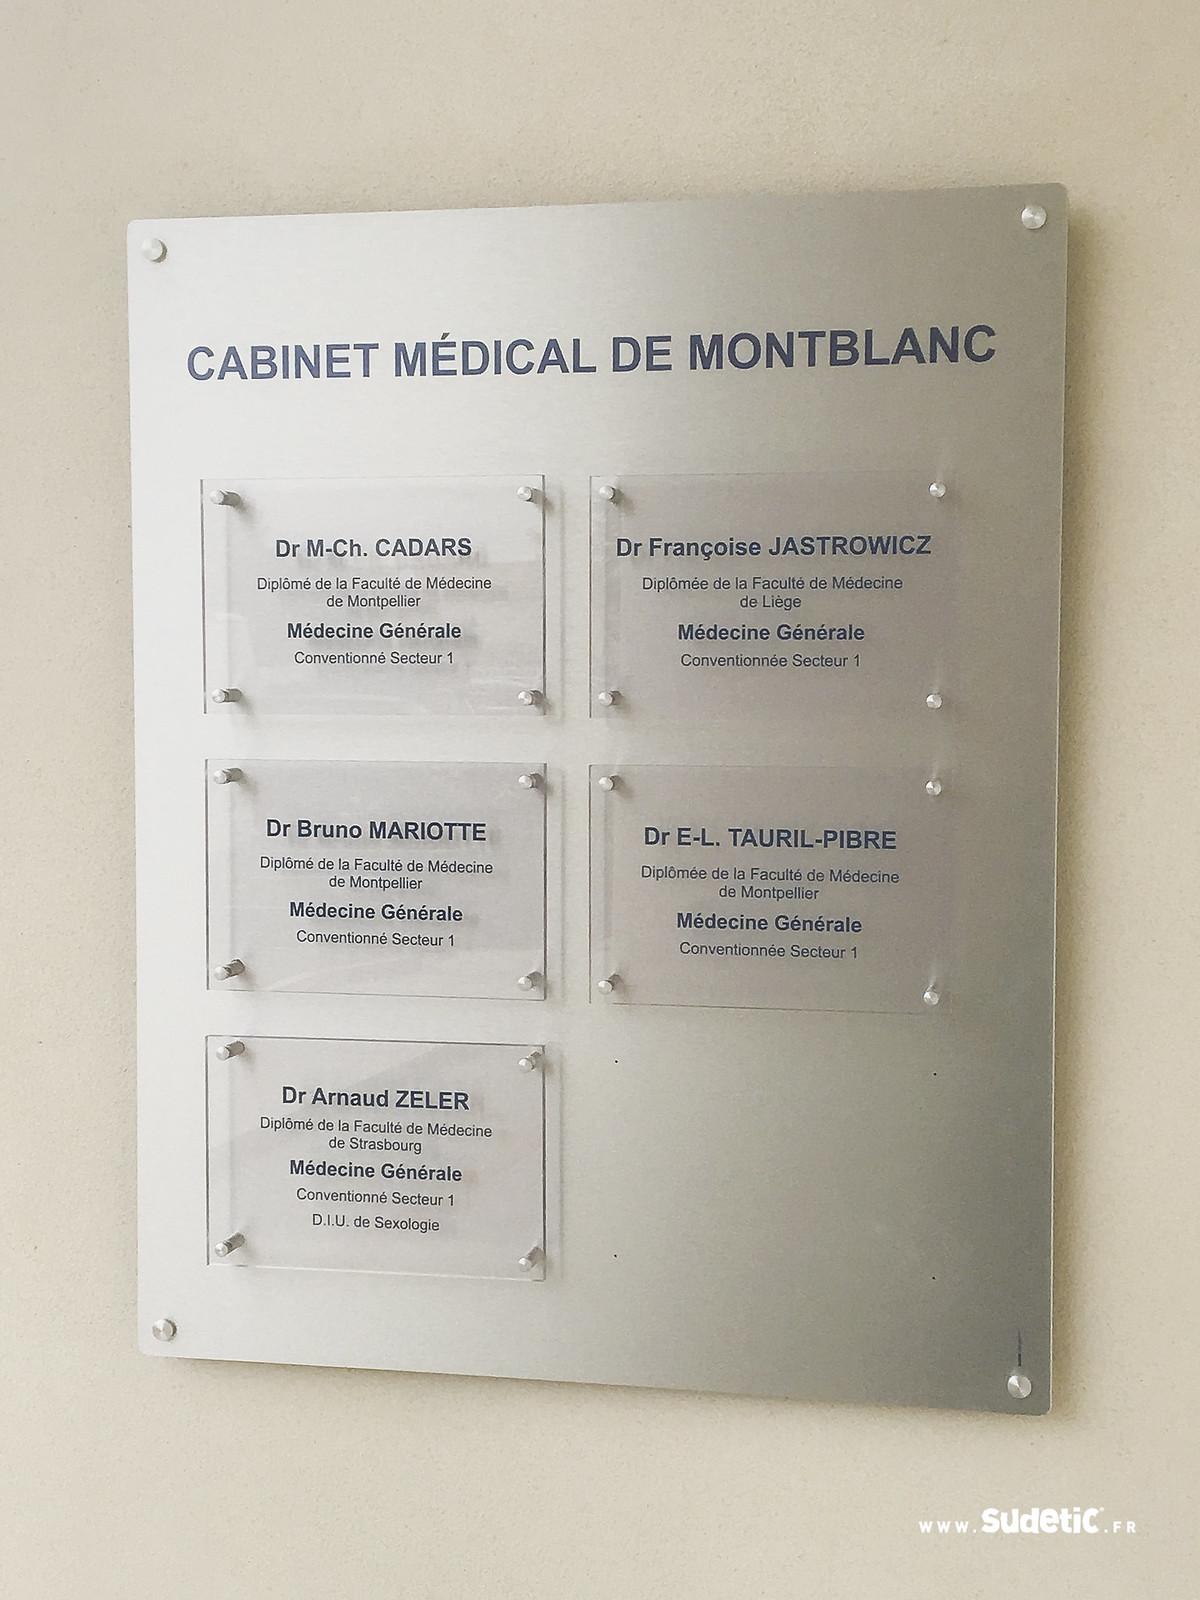 Sudetic plaque pro cabinet medical Montblanc